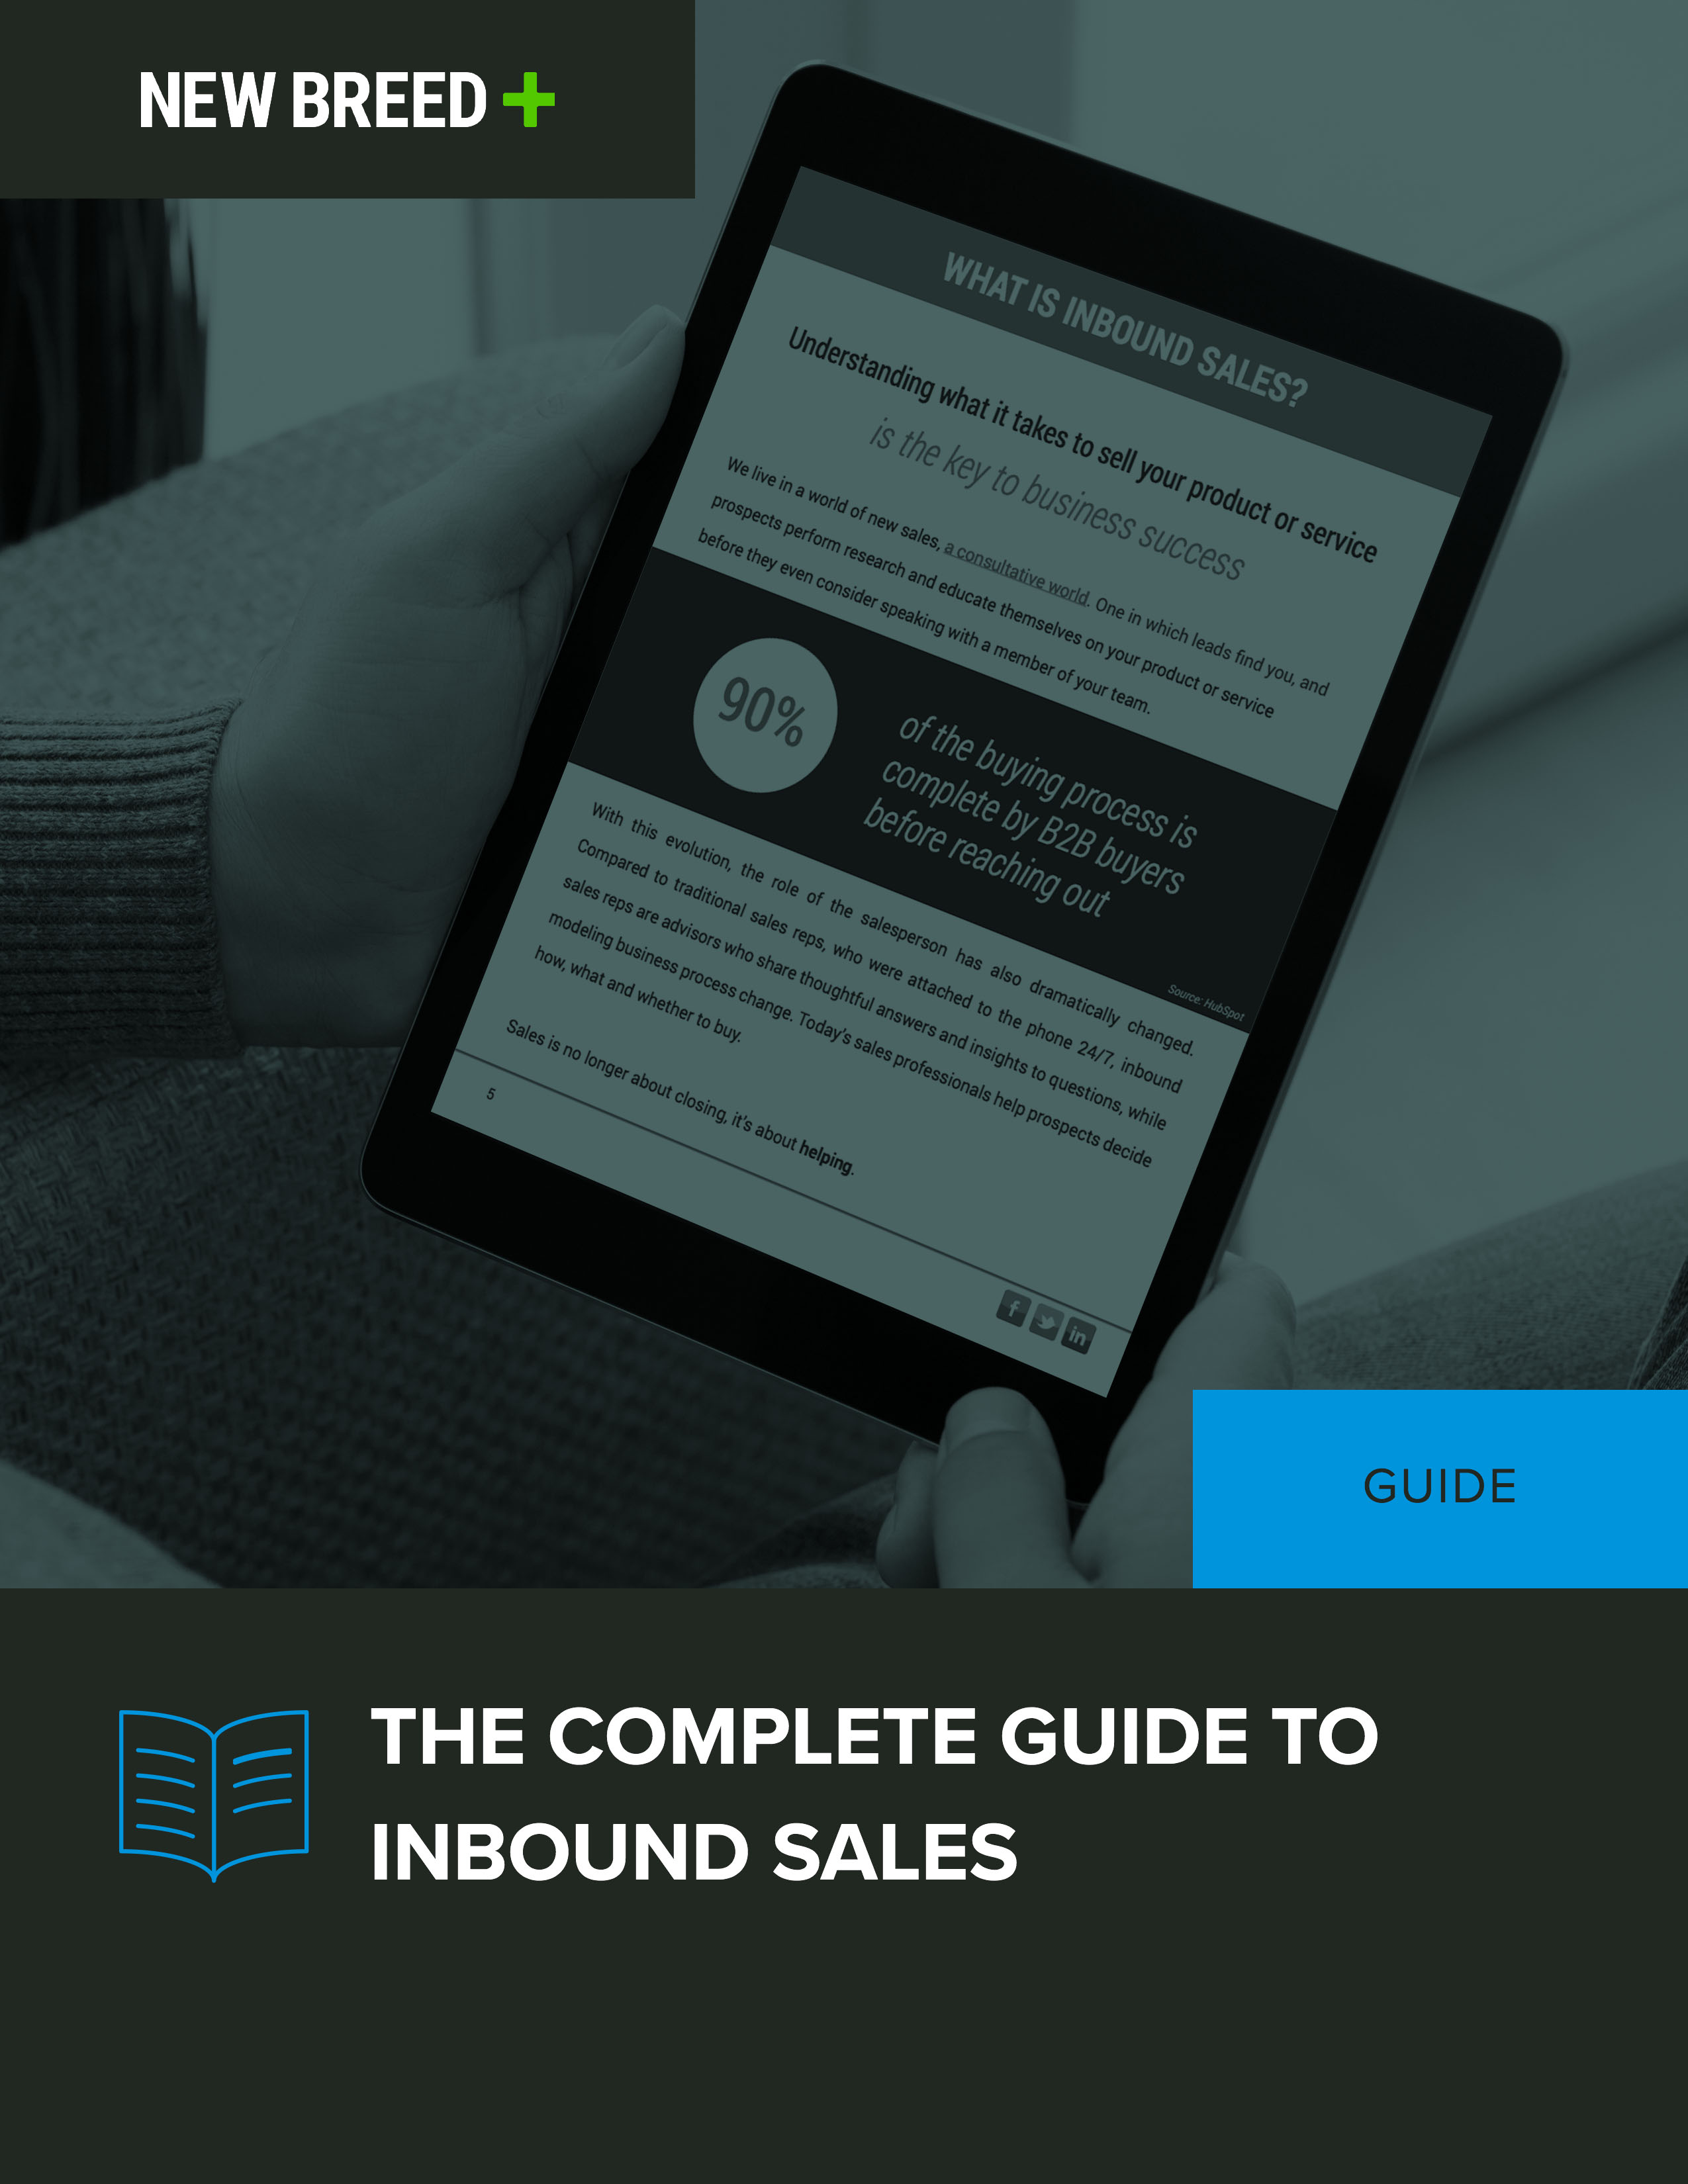 complete guide to inbound sales.jpg